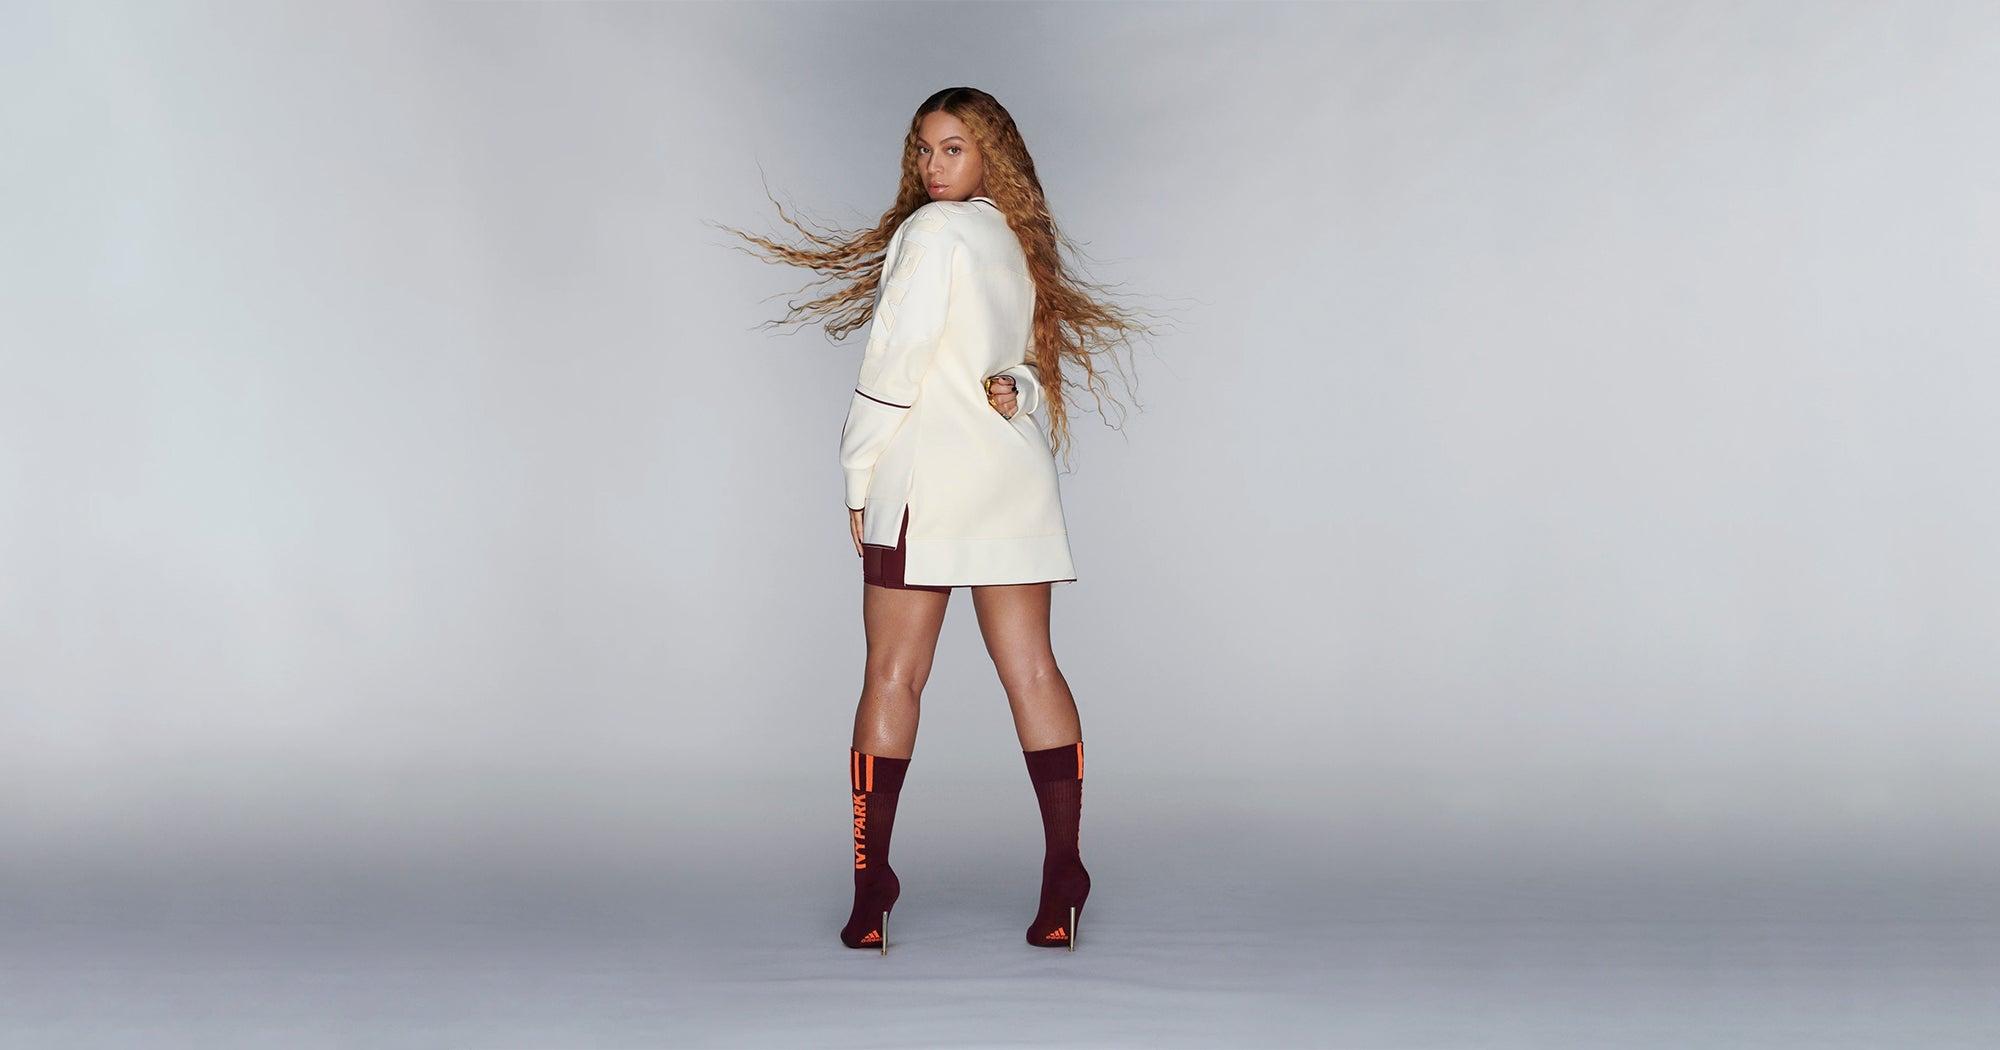 Beyoncé's Adidas x Ivy Park Collab Sparks Criticism From The Plus-Size Community